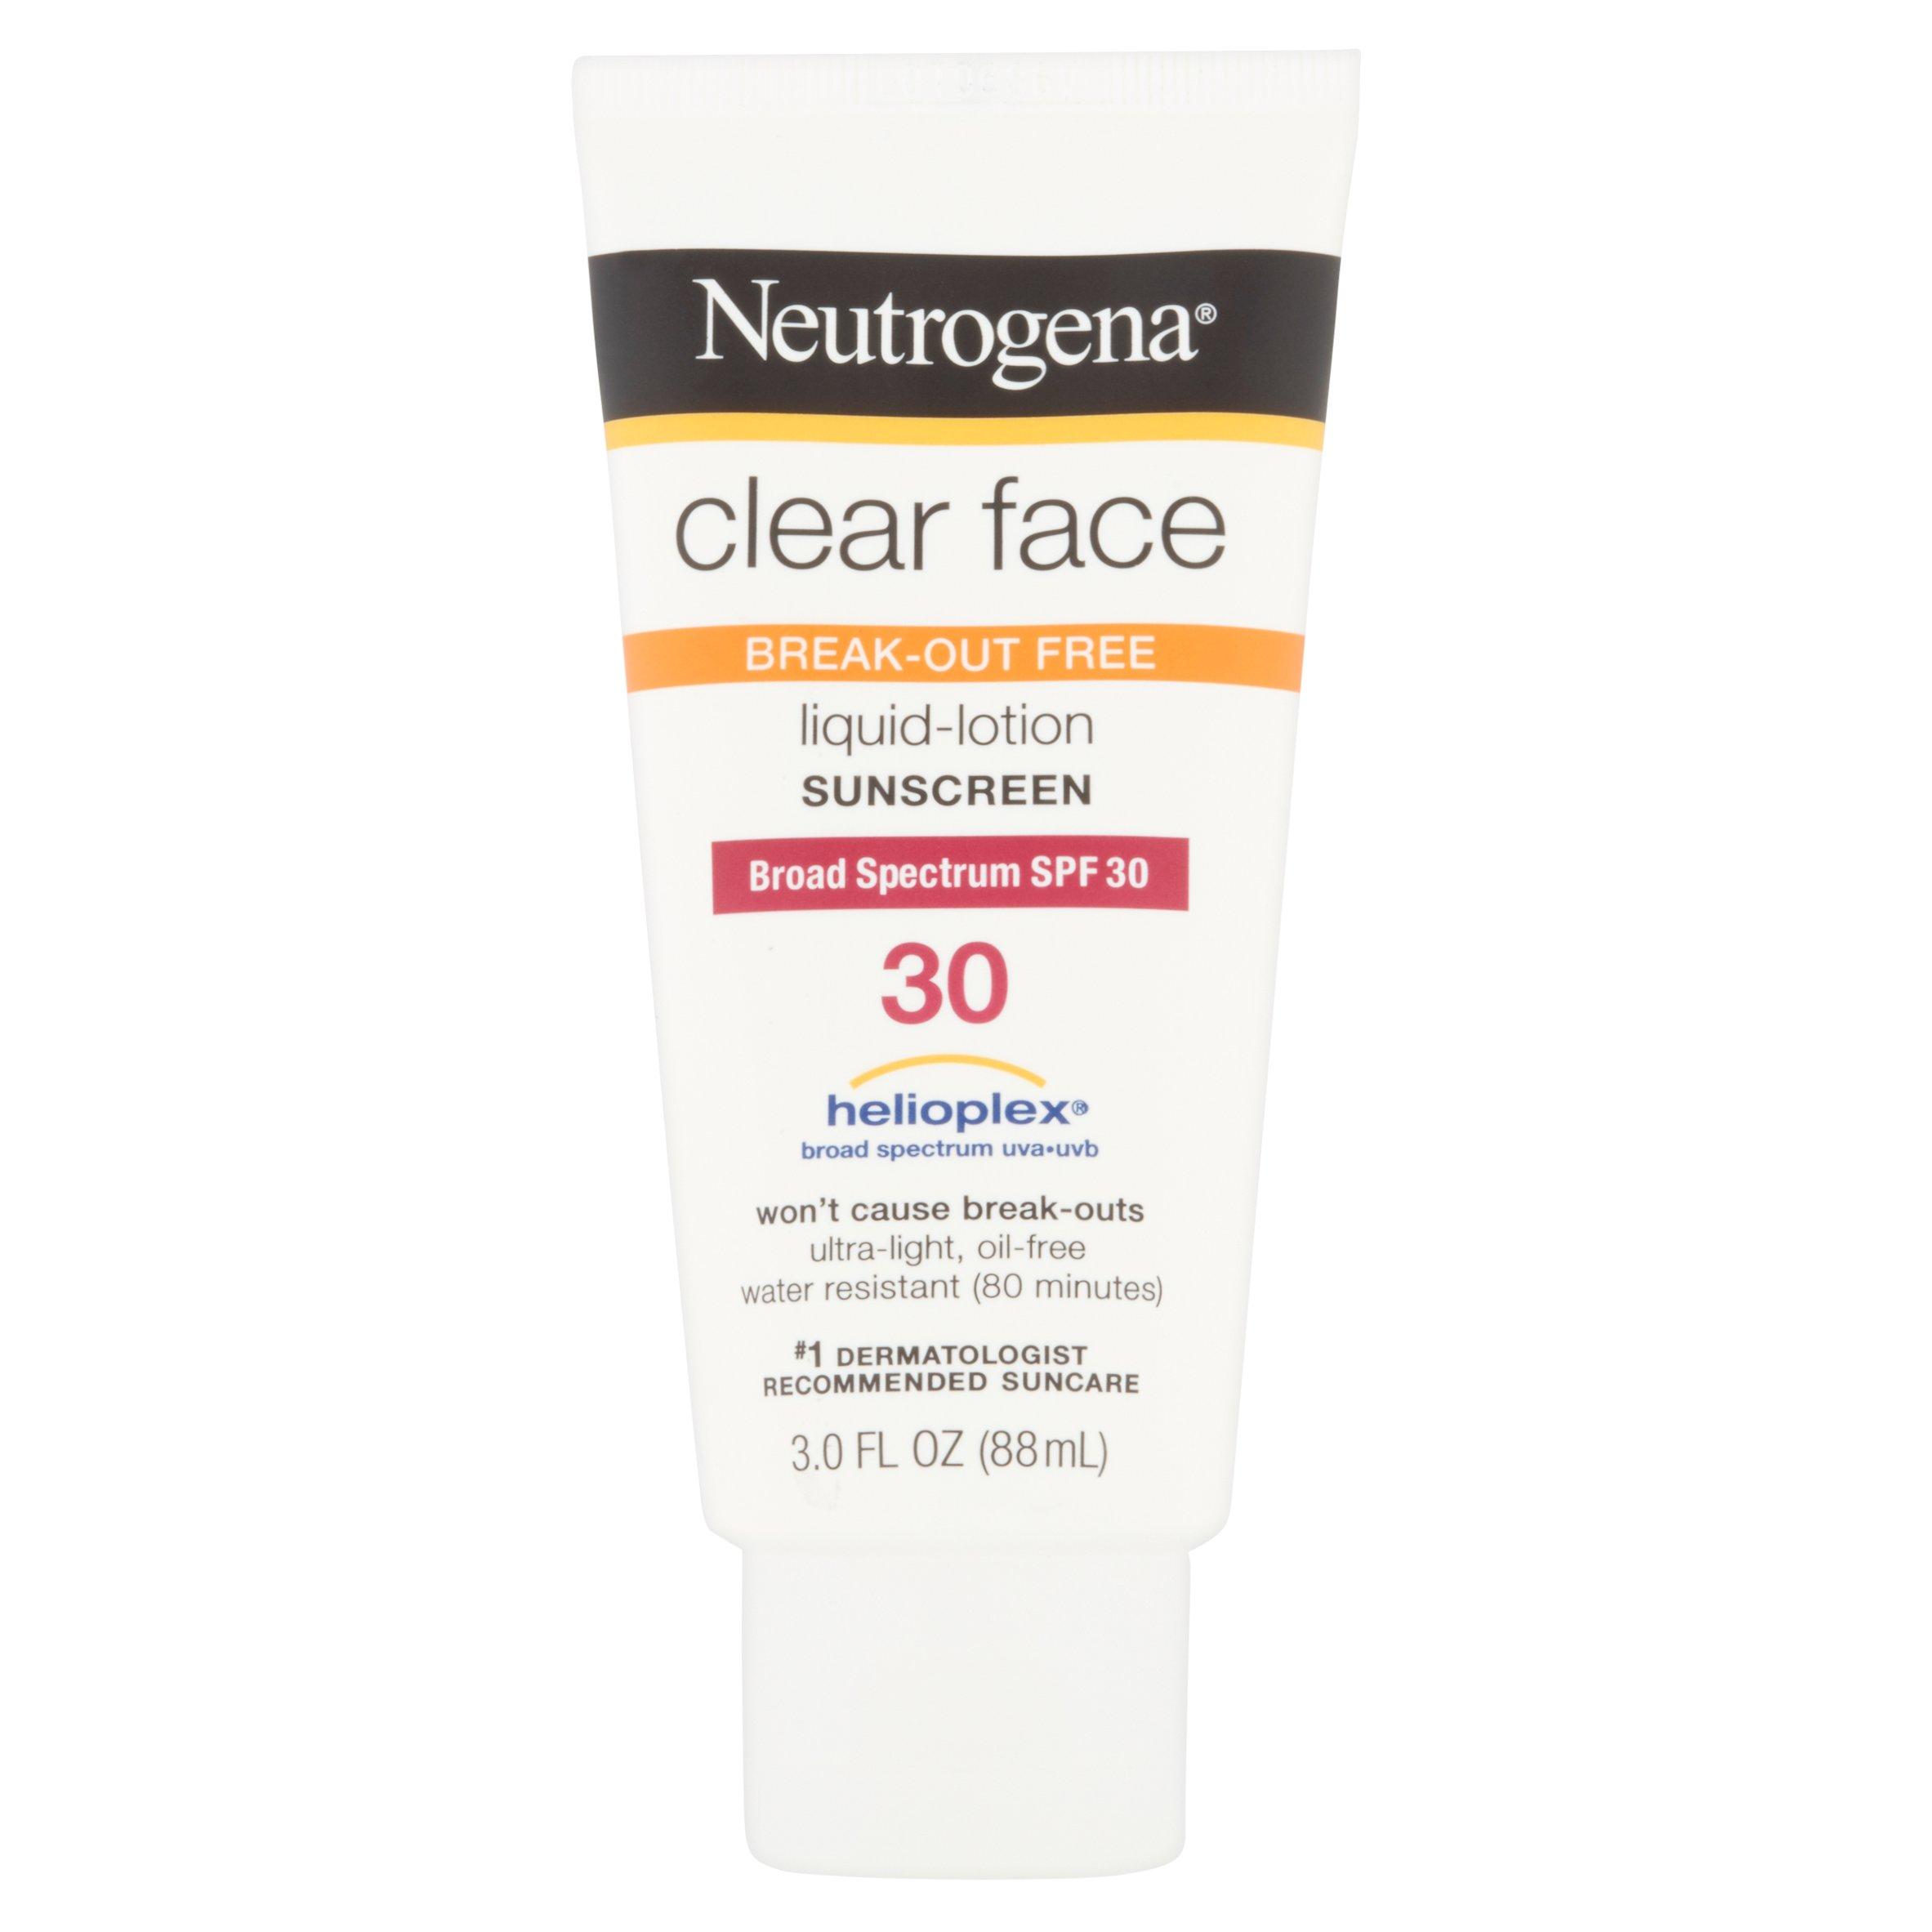 Neutrogena Clear Face Liquid-Lotion Sunscreen Broad Spectrum SPF 30